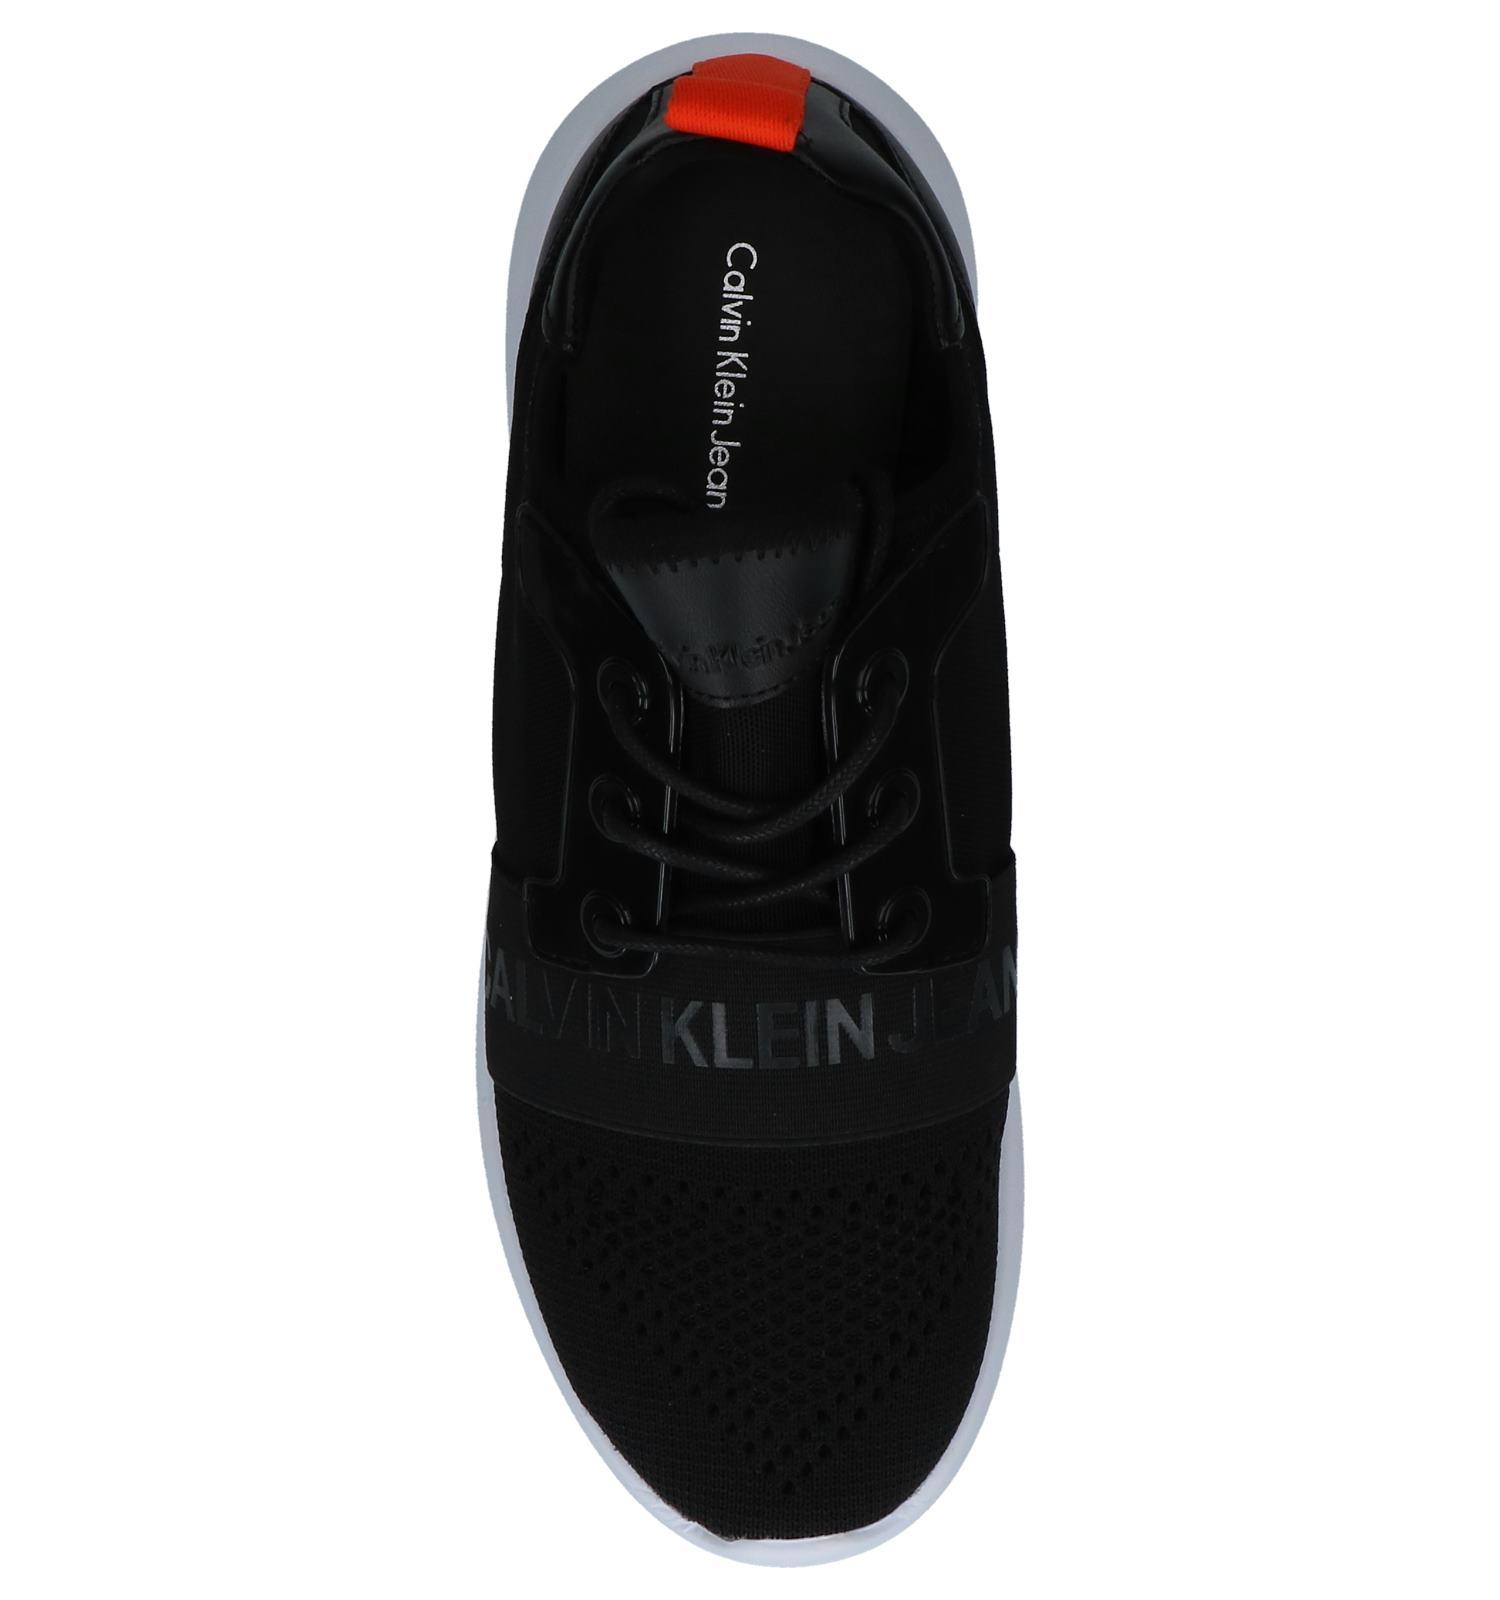 ee5e870efed Calvin Klein Meryl Zwarte Sneakers   TORFS.BE   Gratis verzend en retour